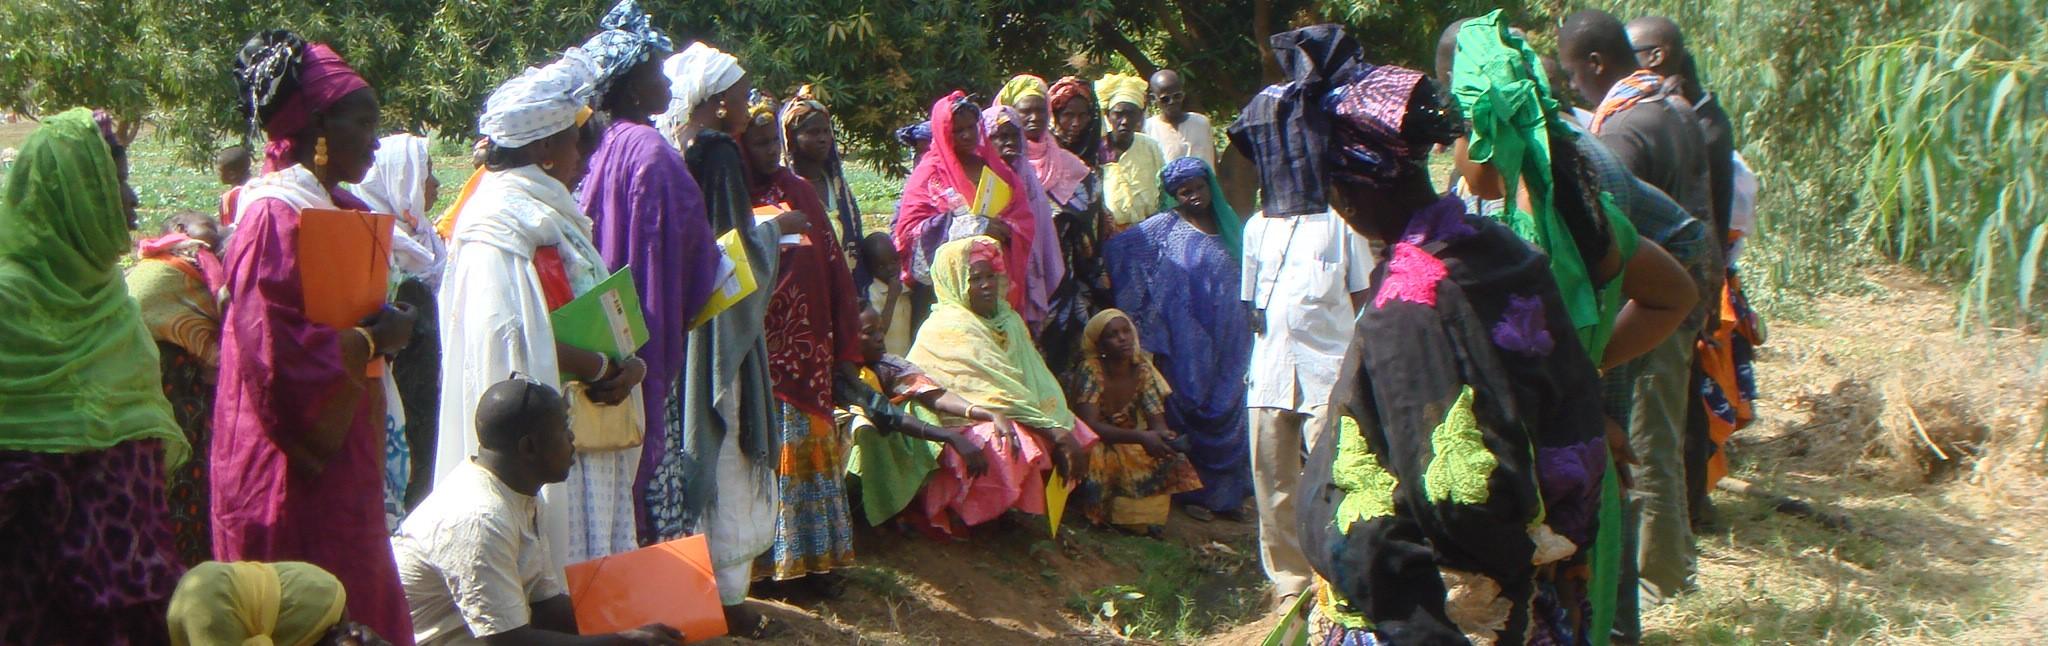 mauritania_formacion cooperativa mujeres_1